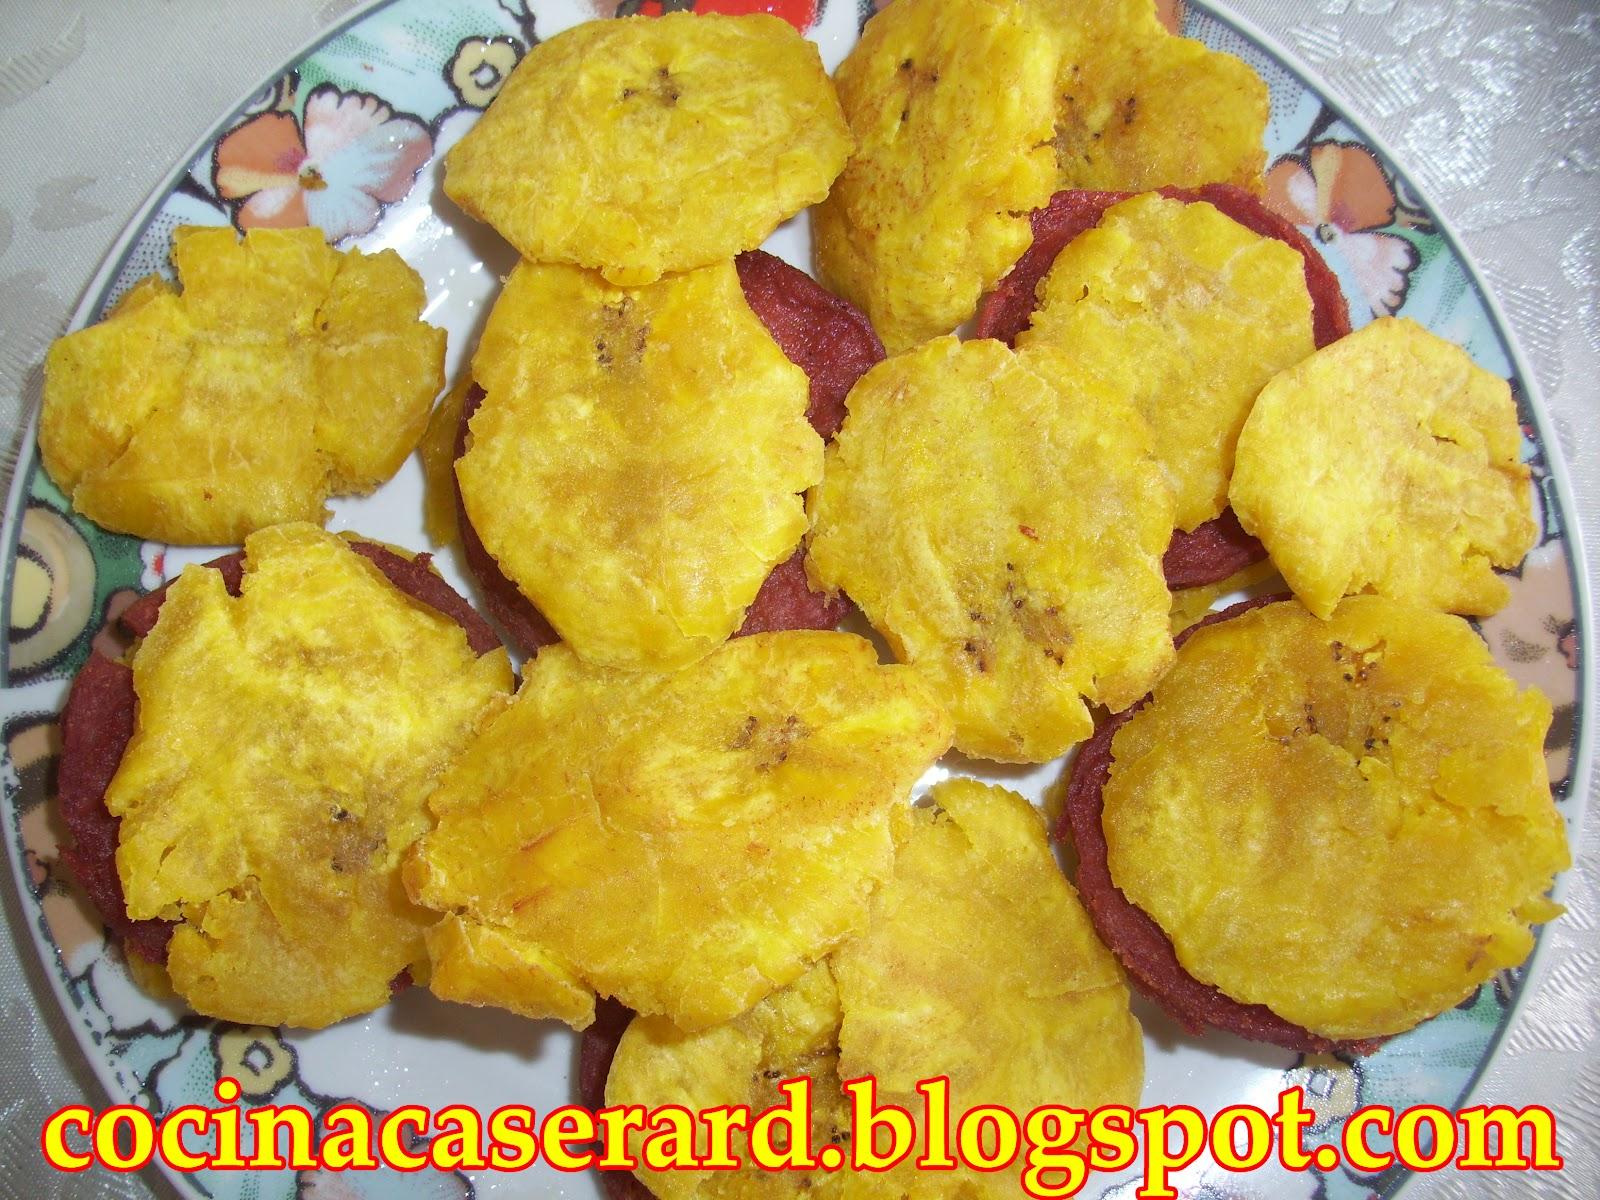 Cocina Casera República Dominicana Fritos De Plátanos Verdes Con Salami